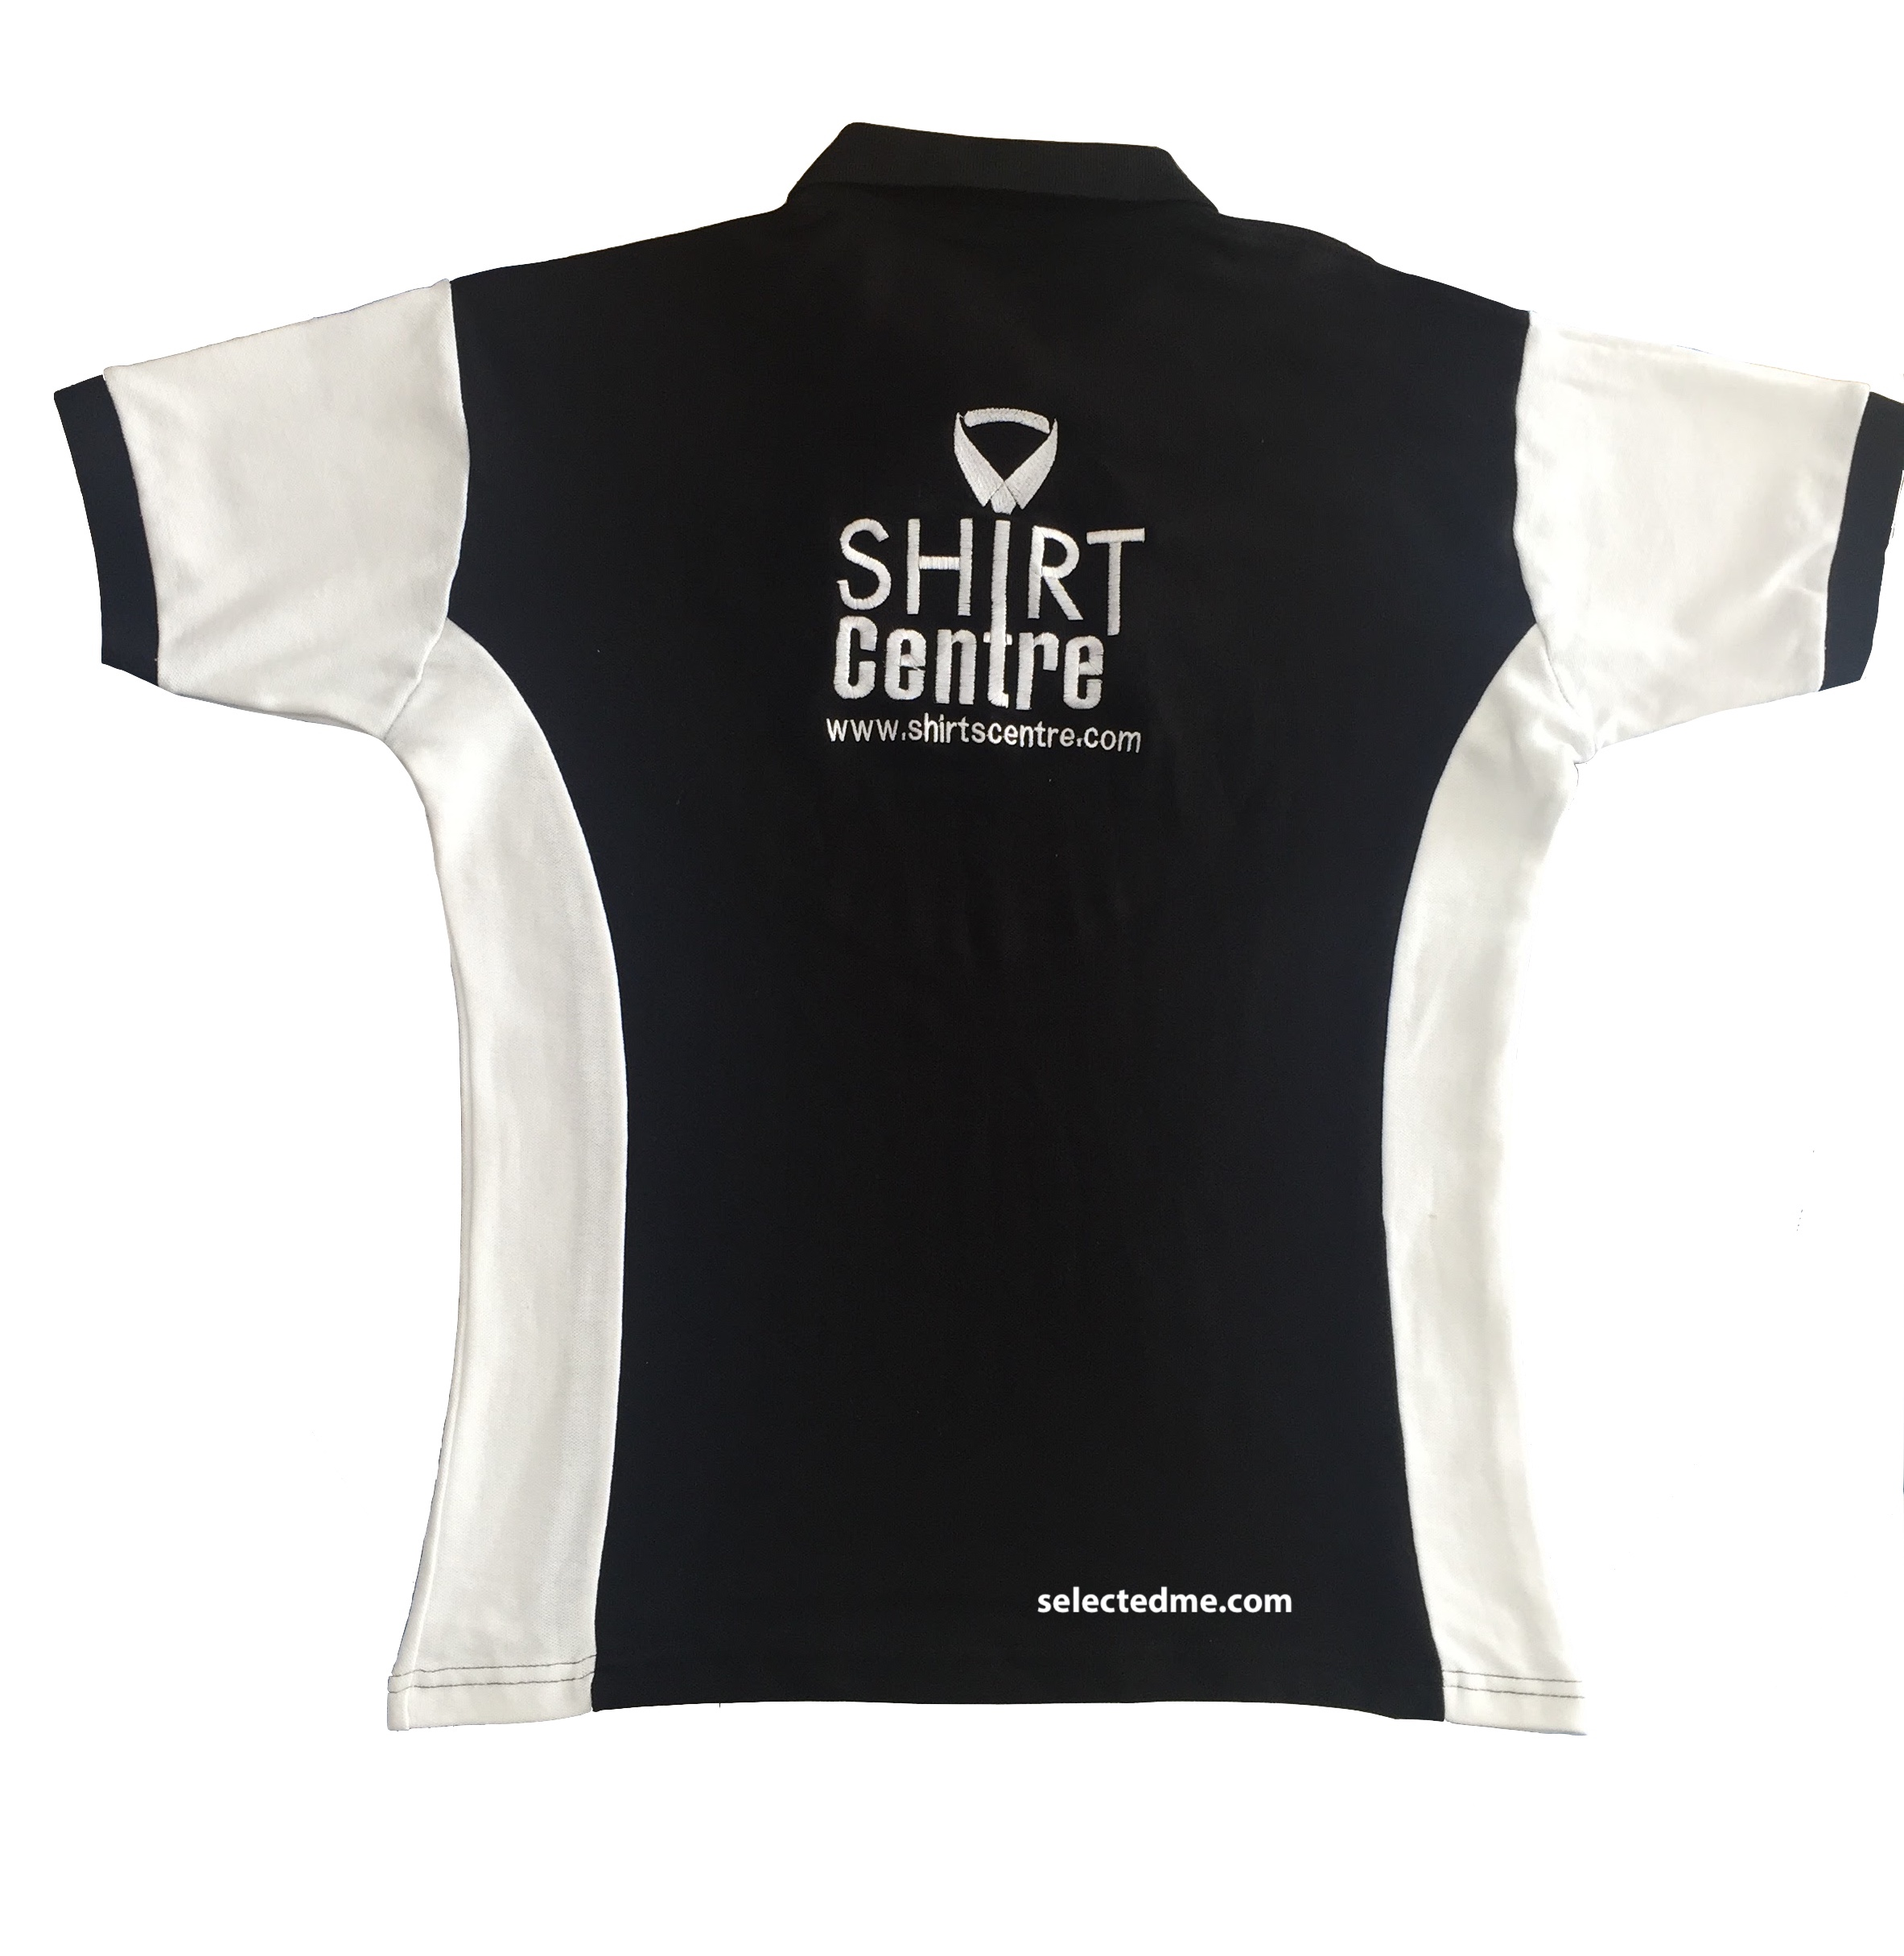 Fashion polo get stylish designer polo shirts for men for Companies that make custom shirts